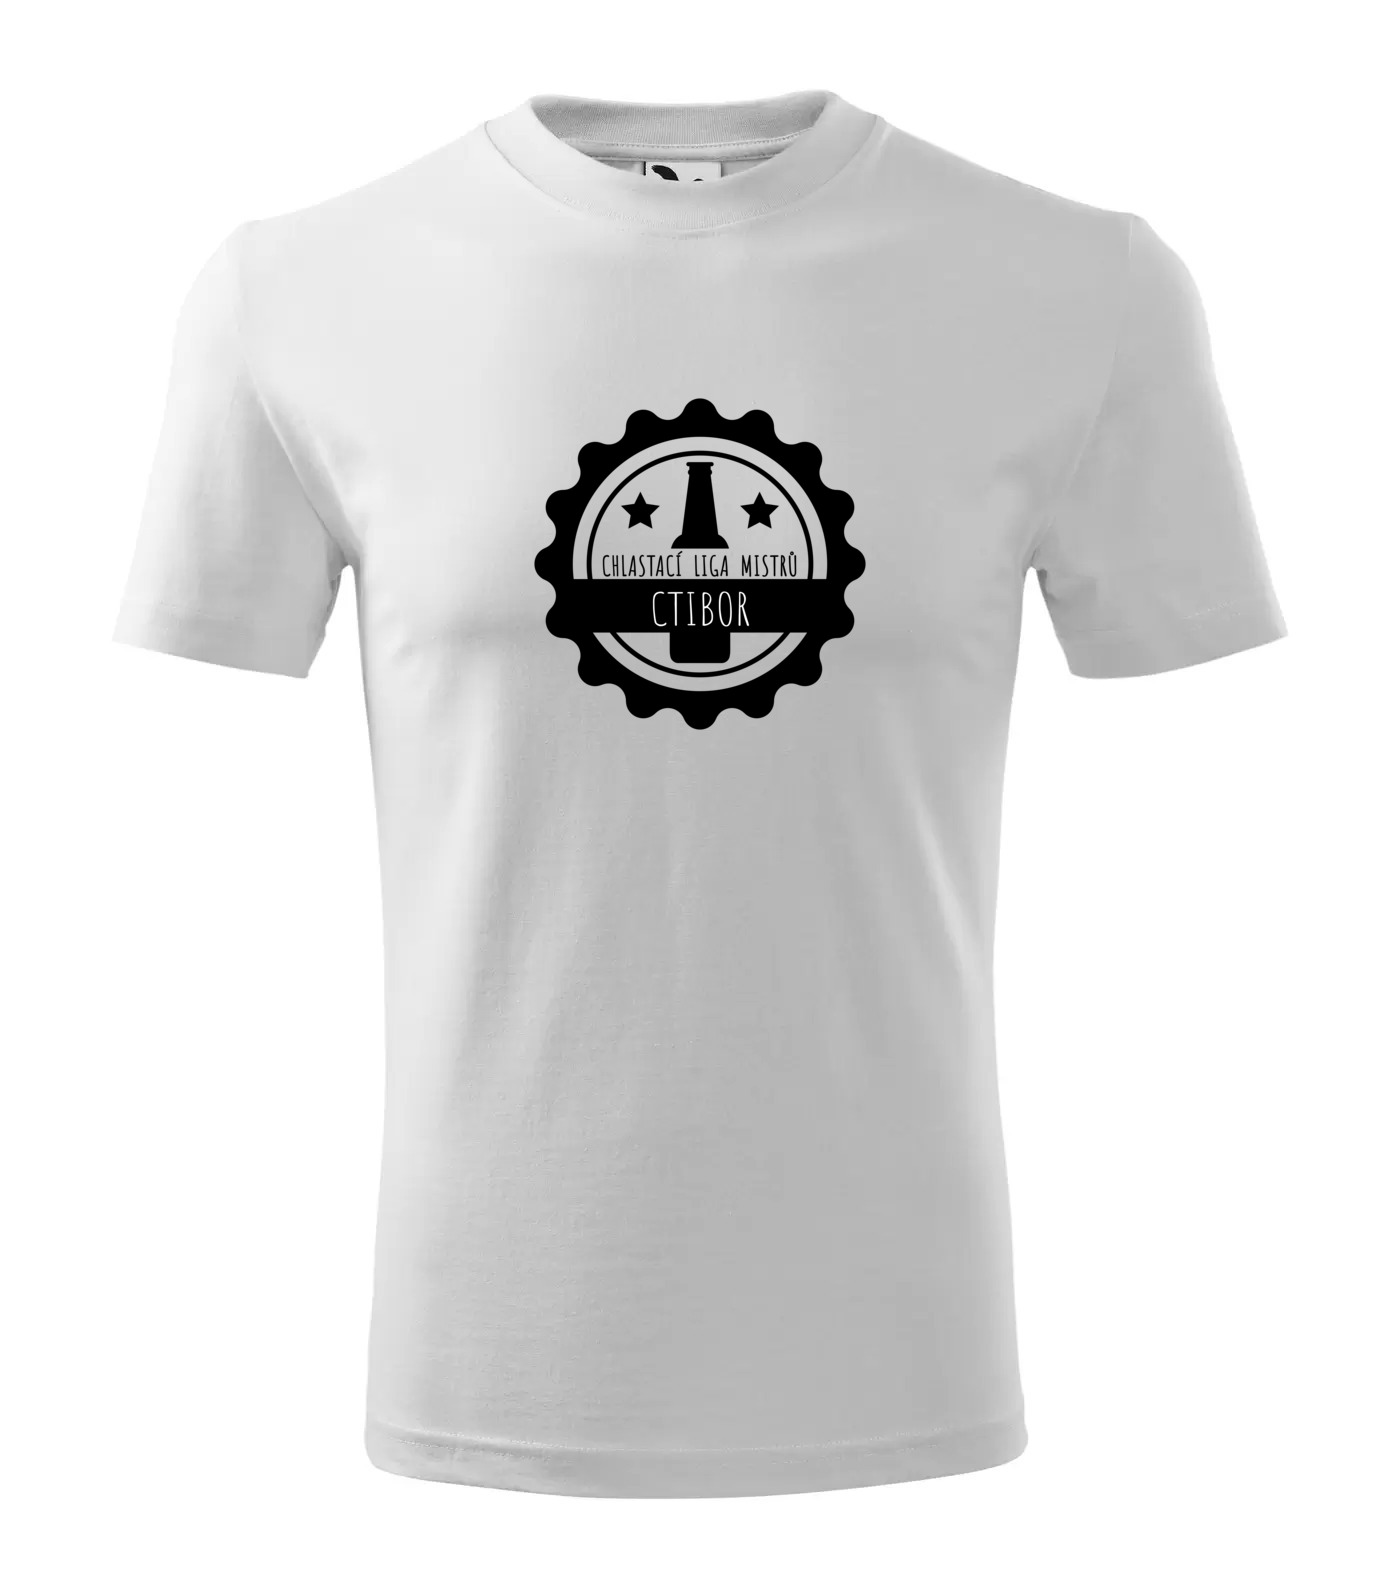 Tričko Chlastací liga mužů Ctibor